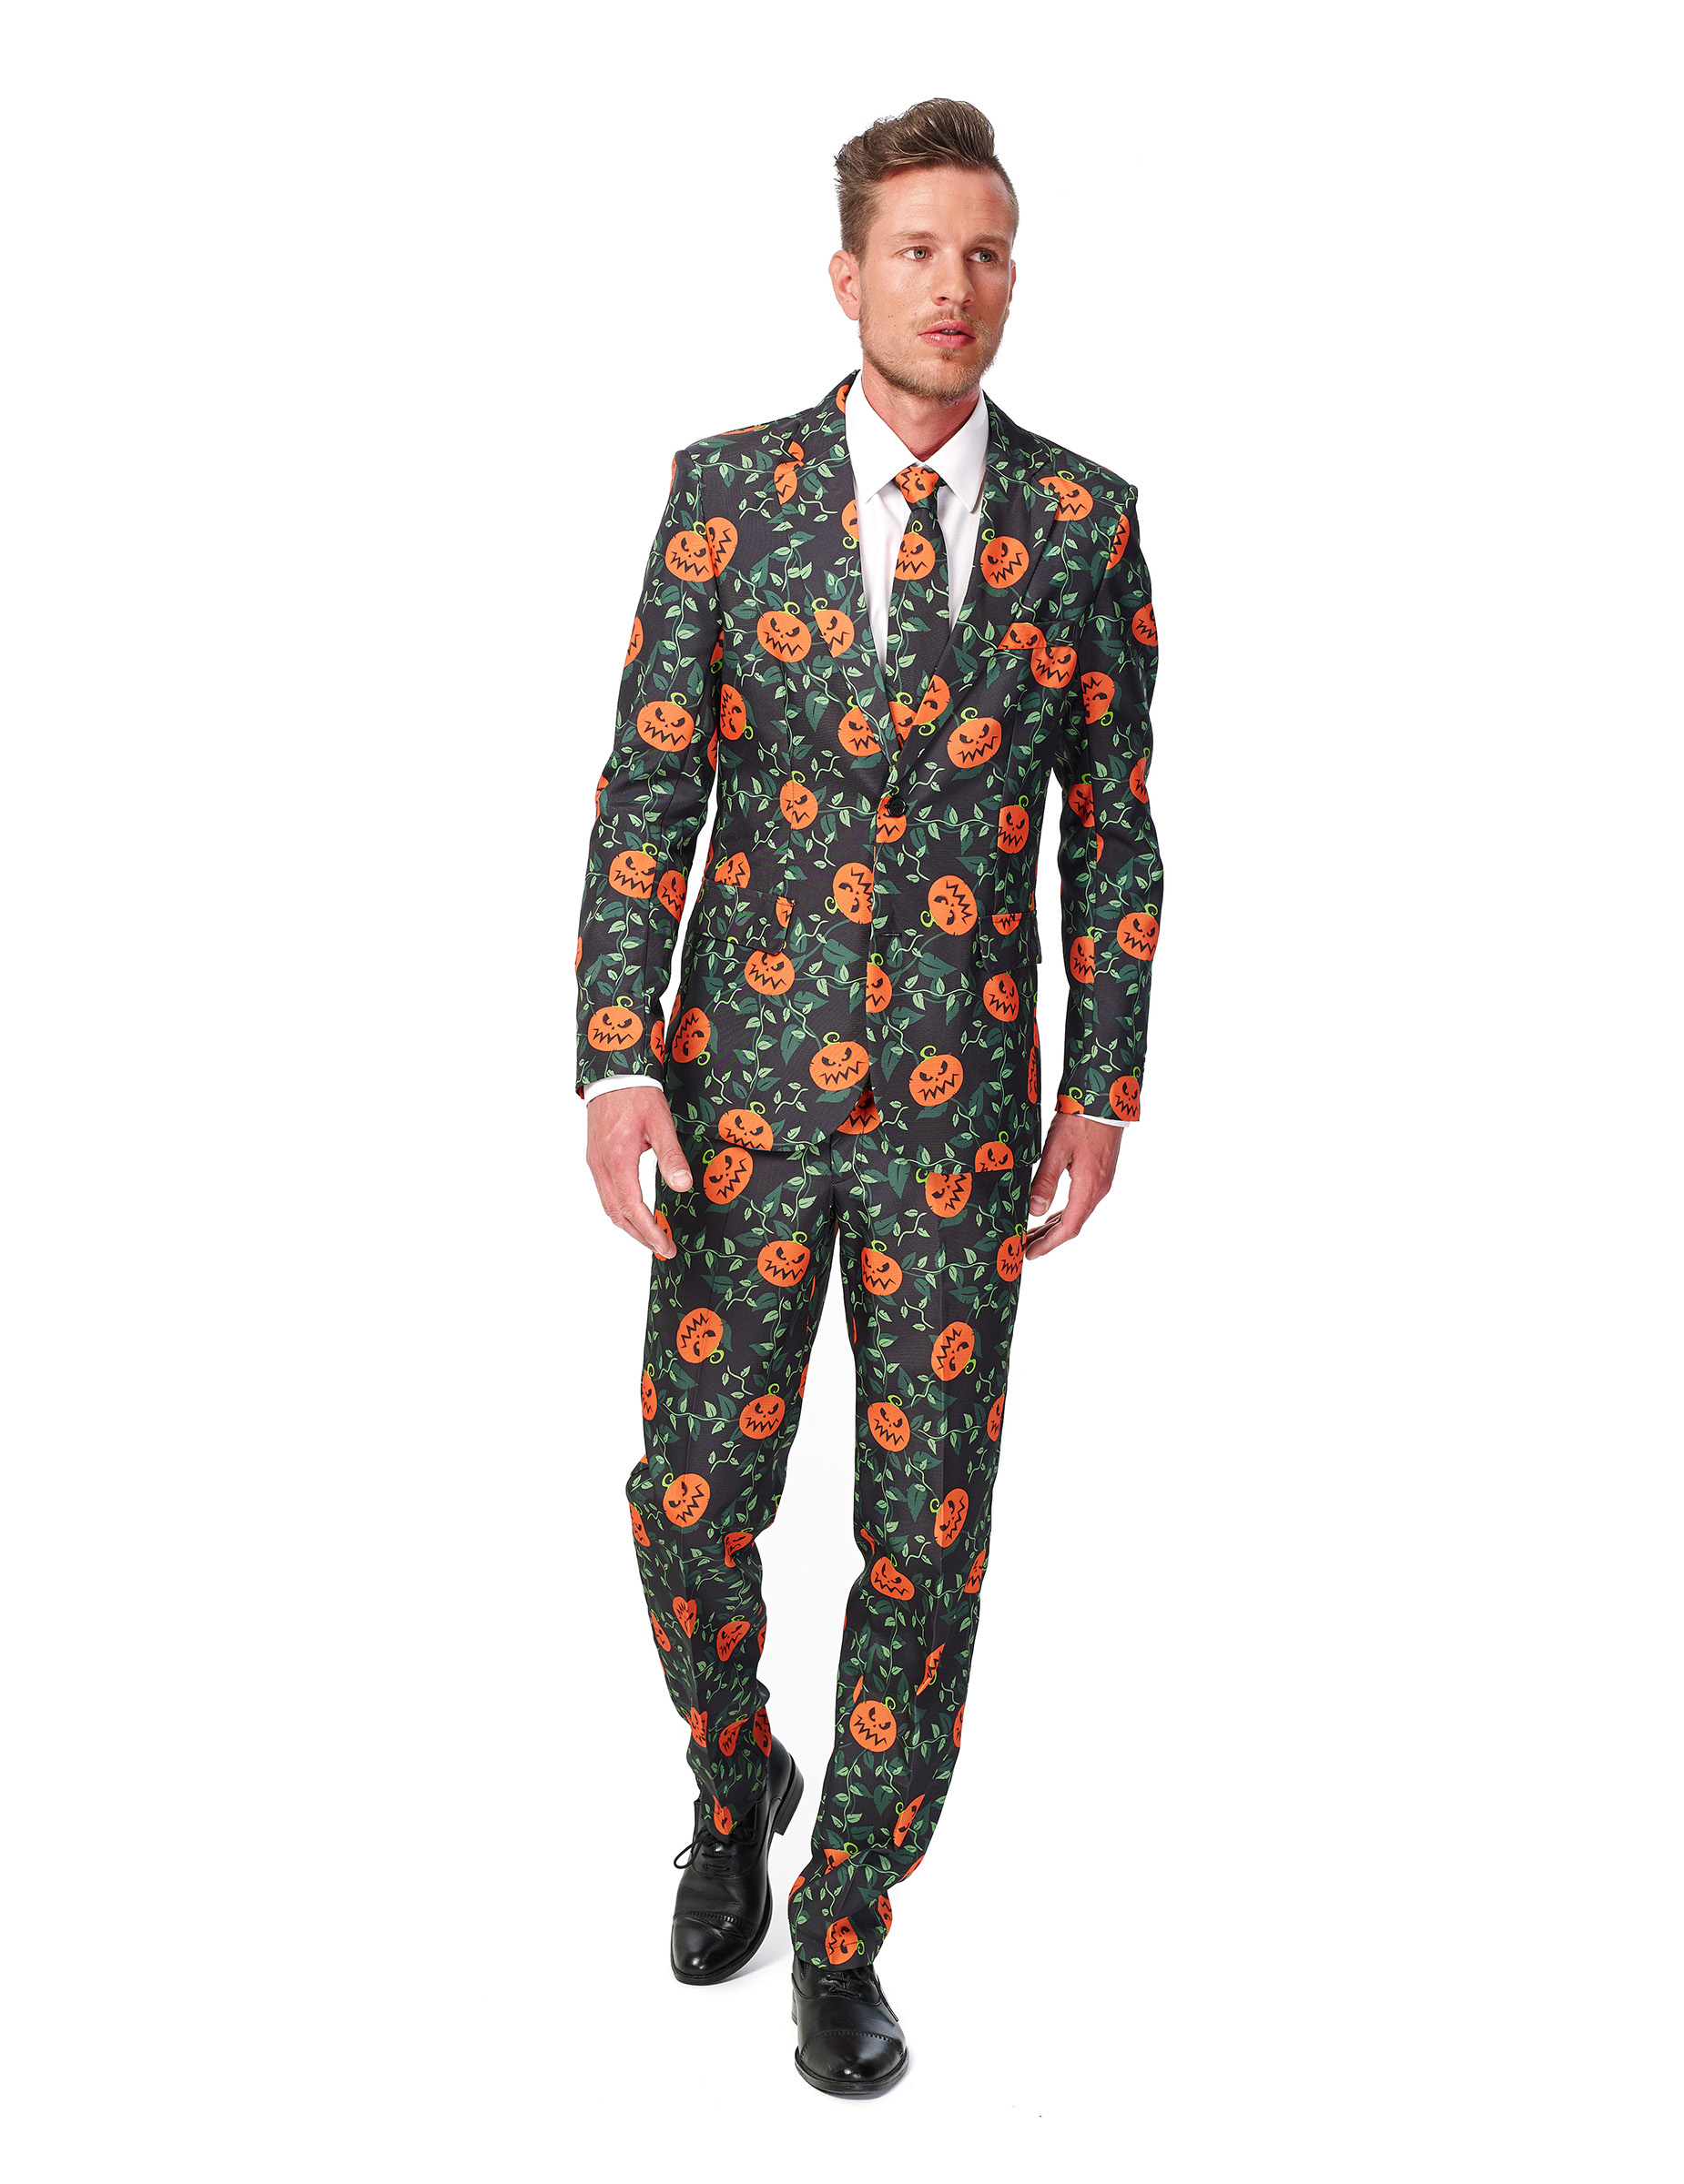 Costume Mr. Pumpkin homme Suitmeister™   Deguise-toi 06eeac25ff3